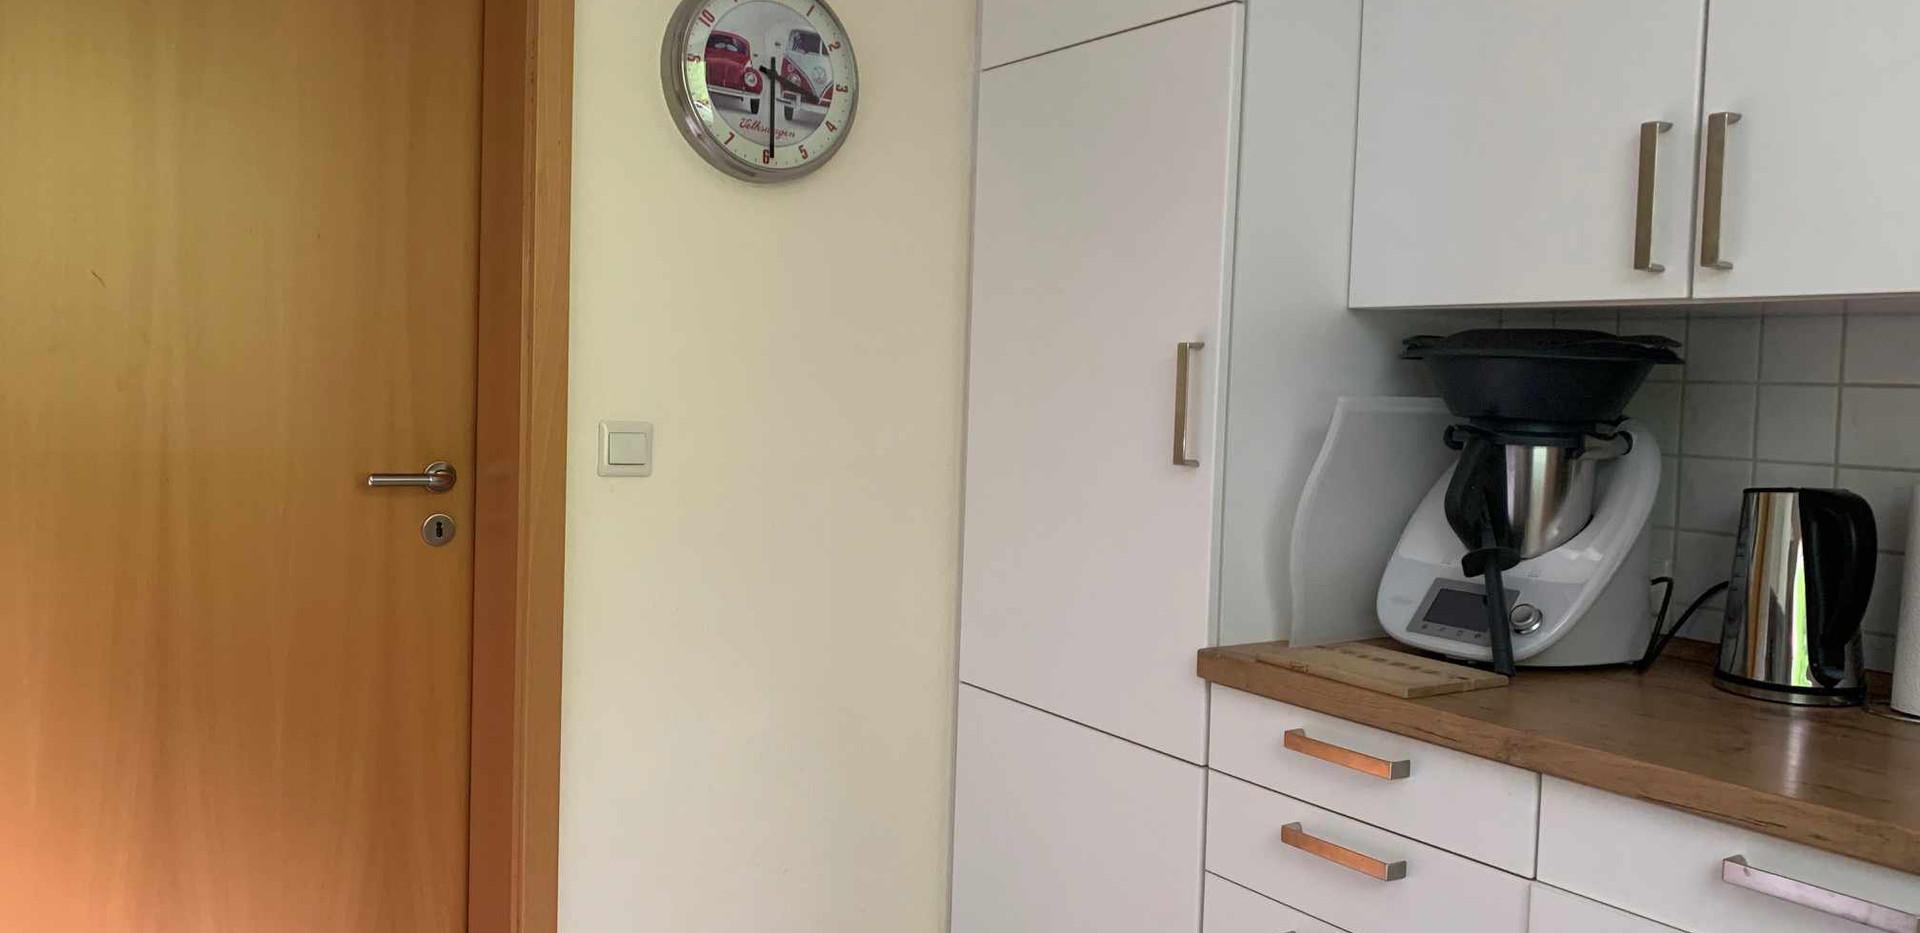 Wohnweisend_Immobilien_Kueche2_WVME520HB